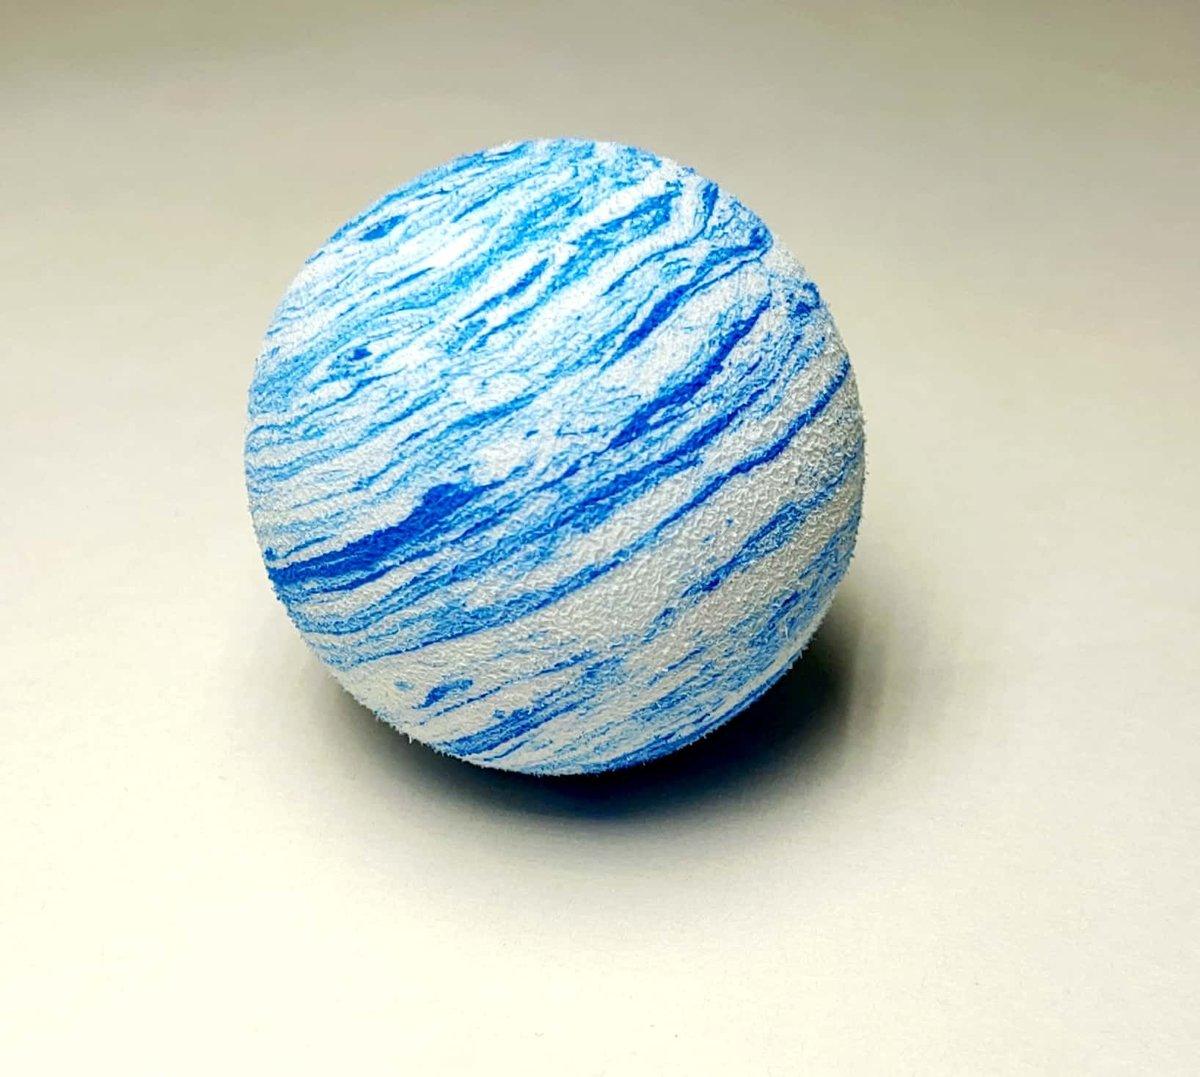 彩虹球 寵物球 狗遊樂場玩具(BLUE AND WHITE) 4cm直徑